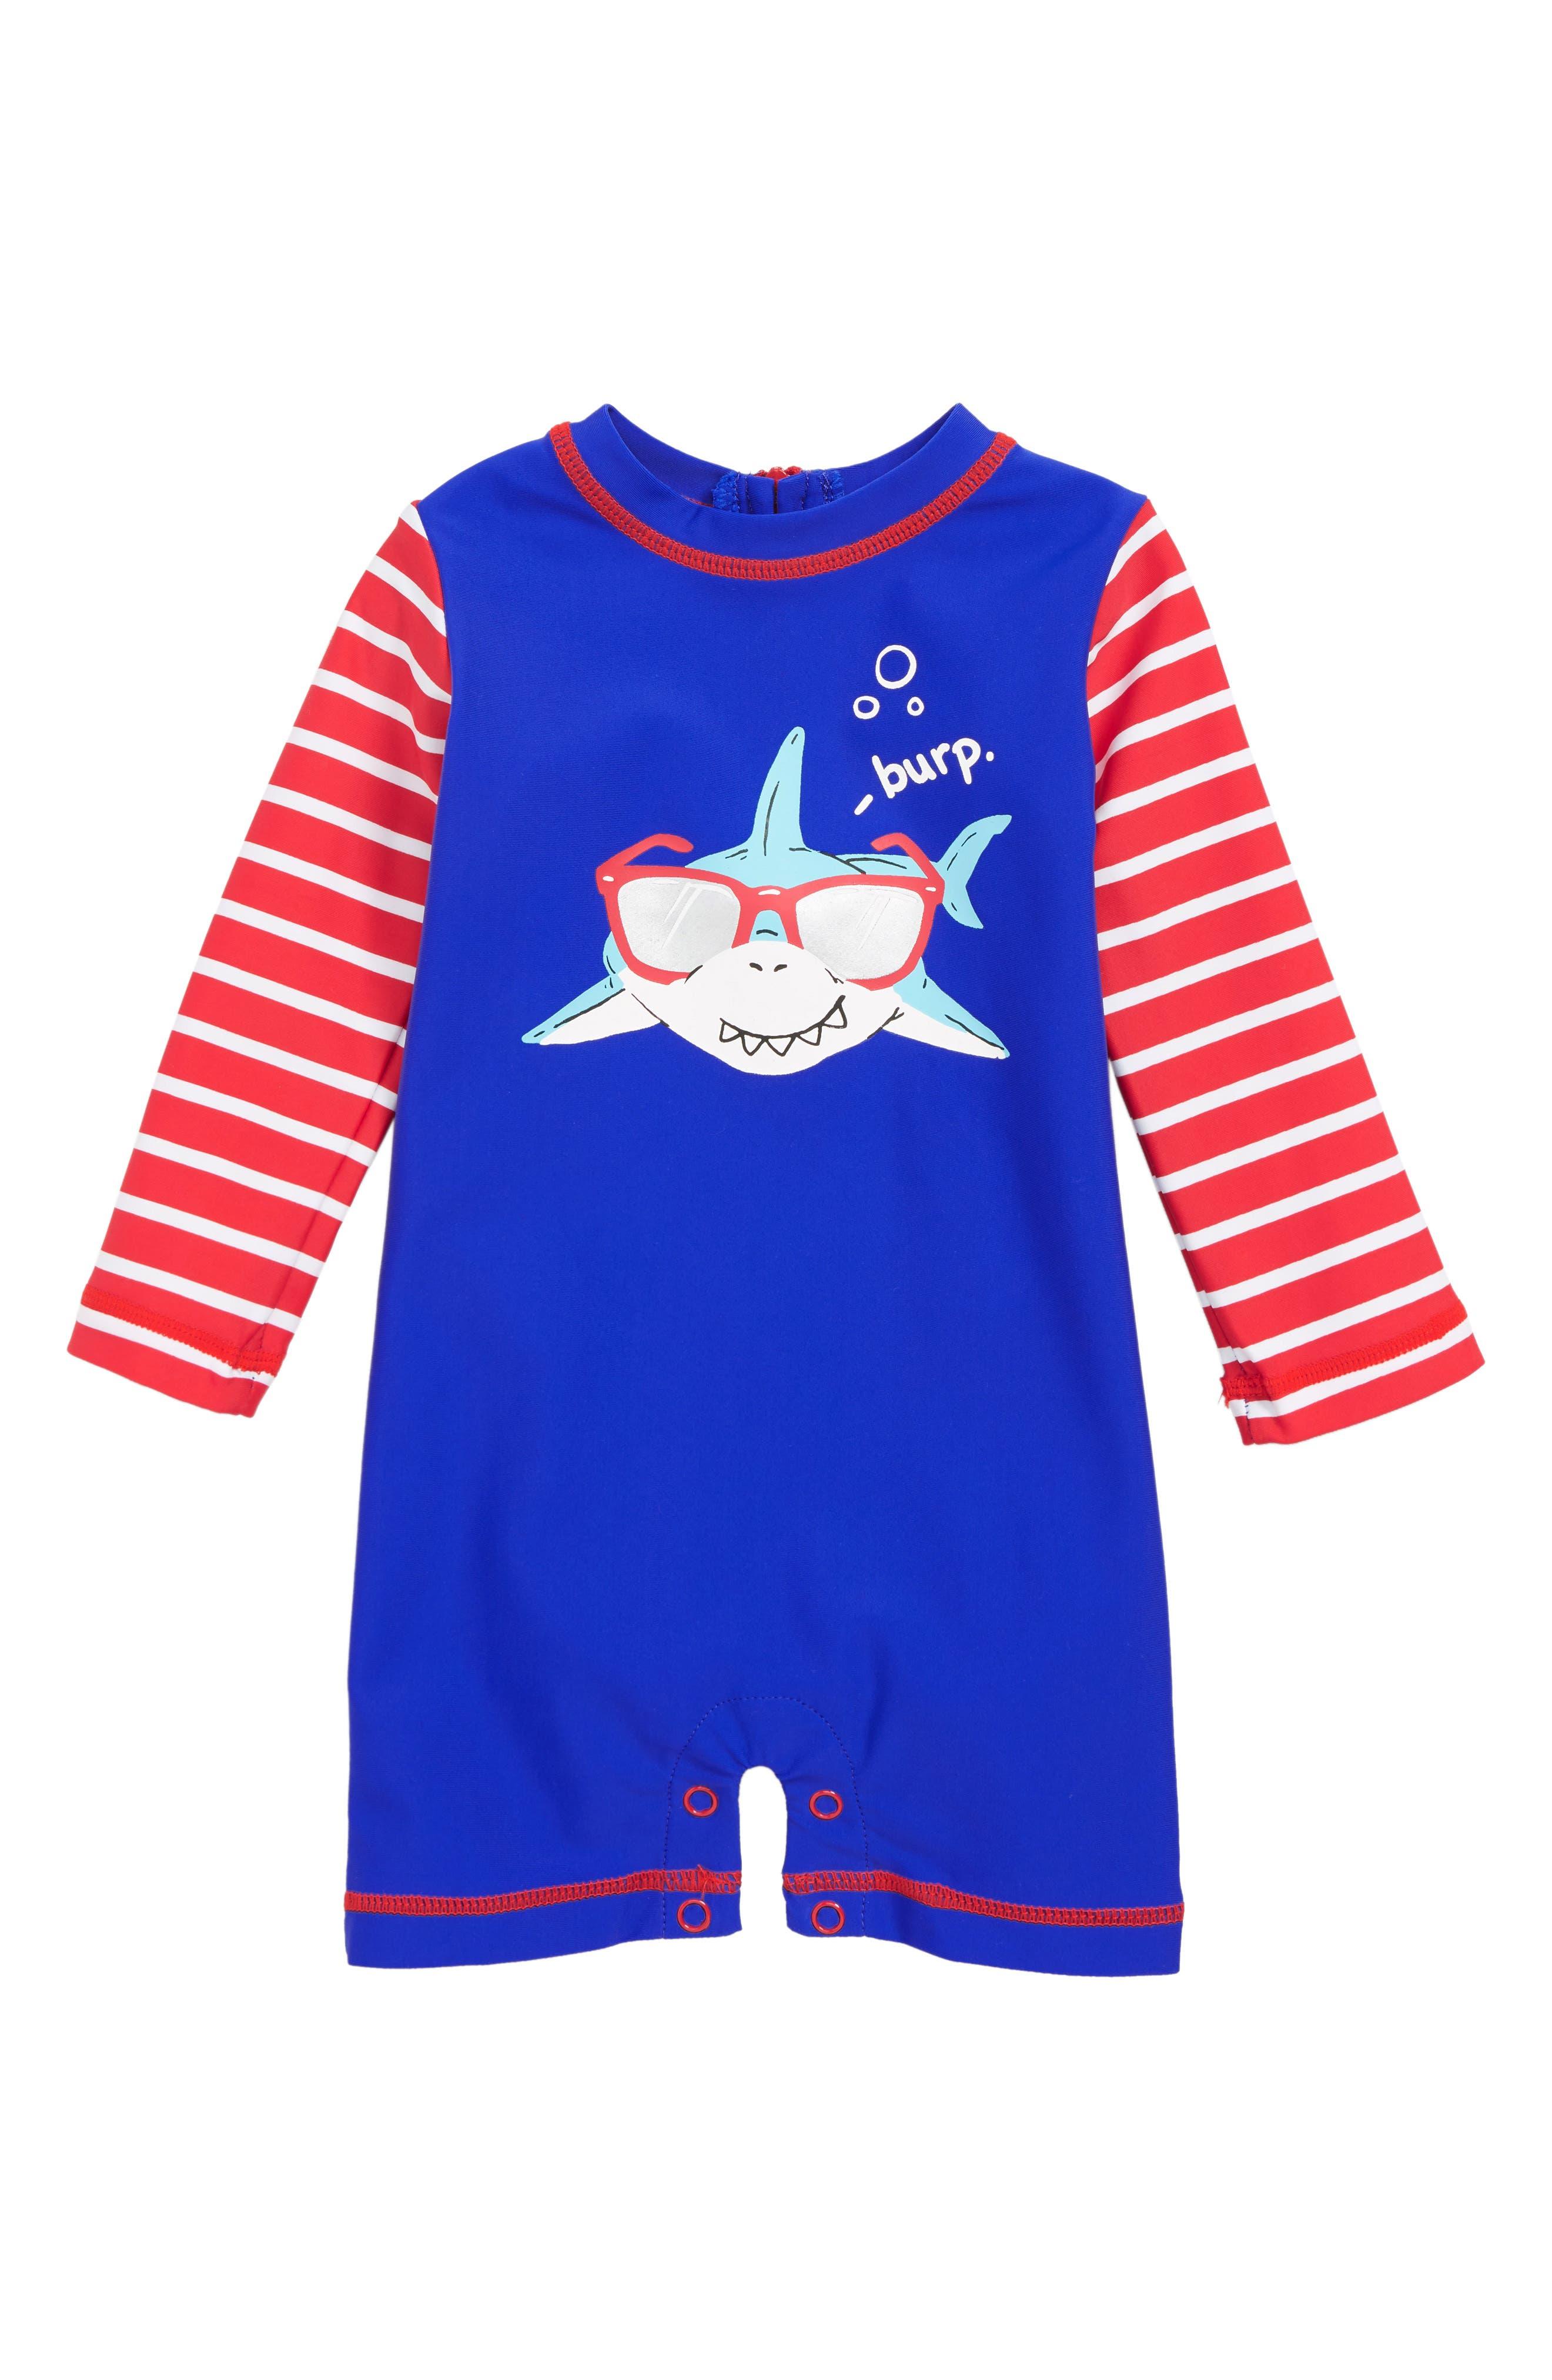 HATLEY Cool Shark One-Piece Rashguard Swimsuit, Main, color, BLUE